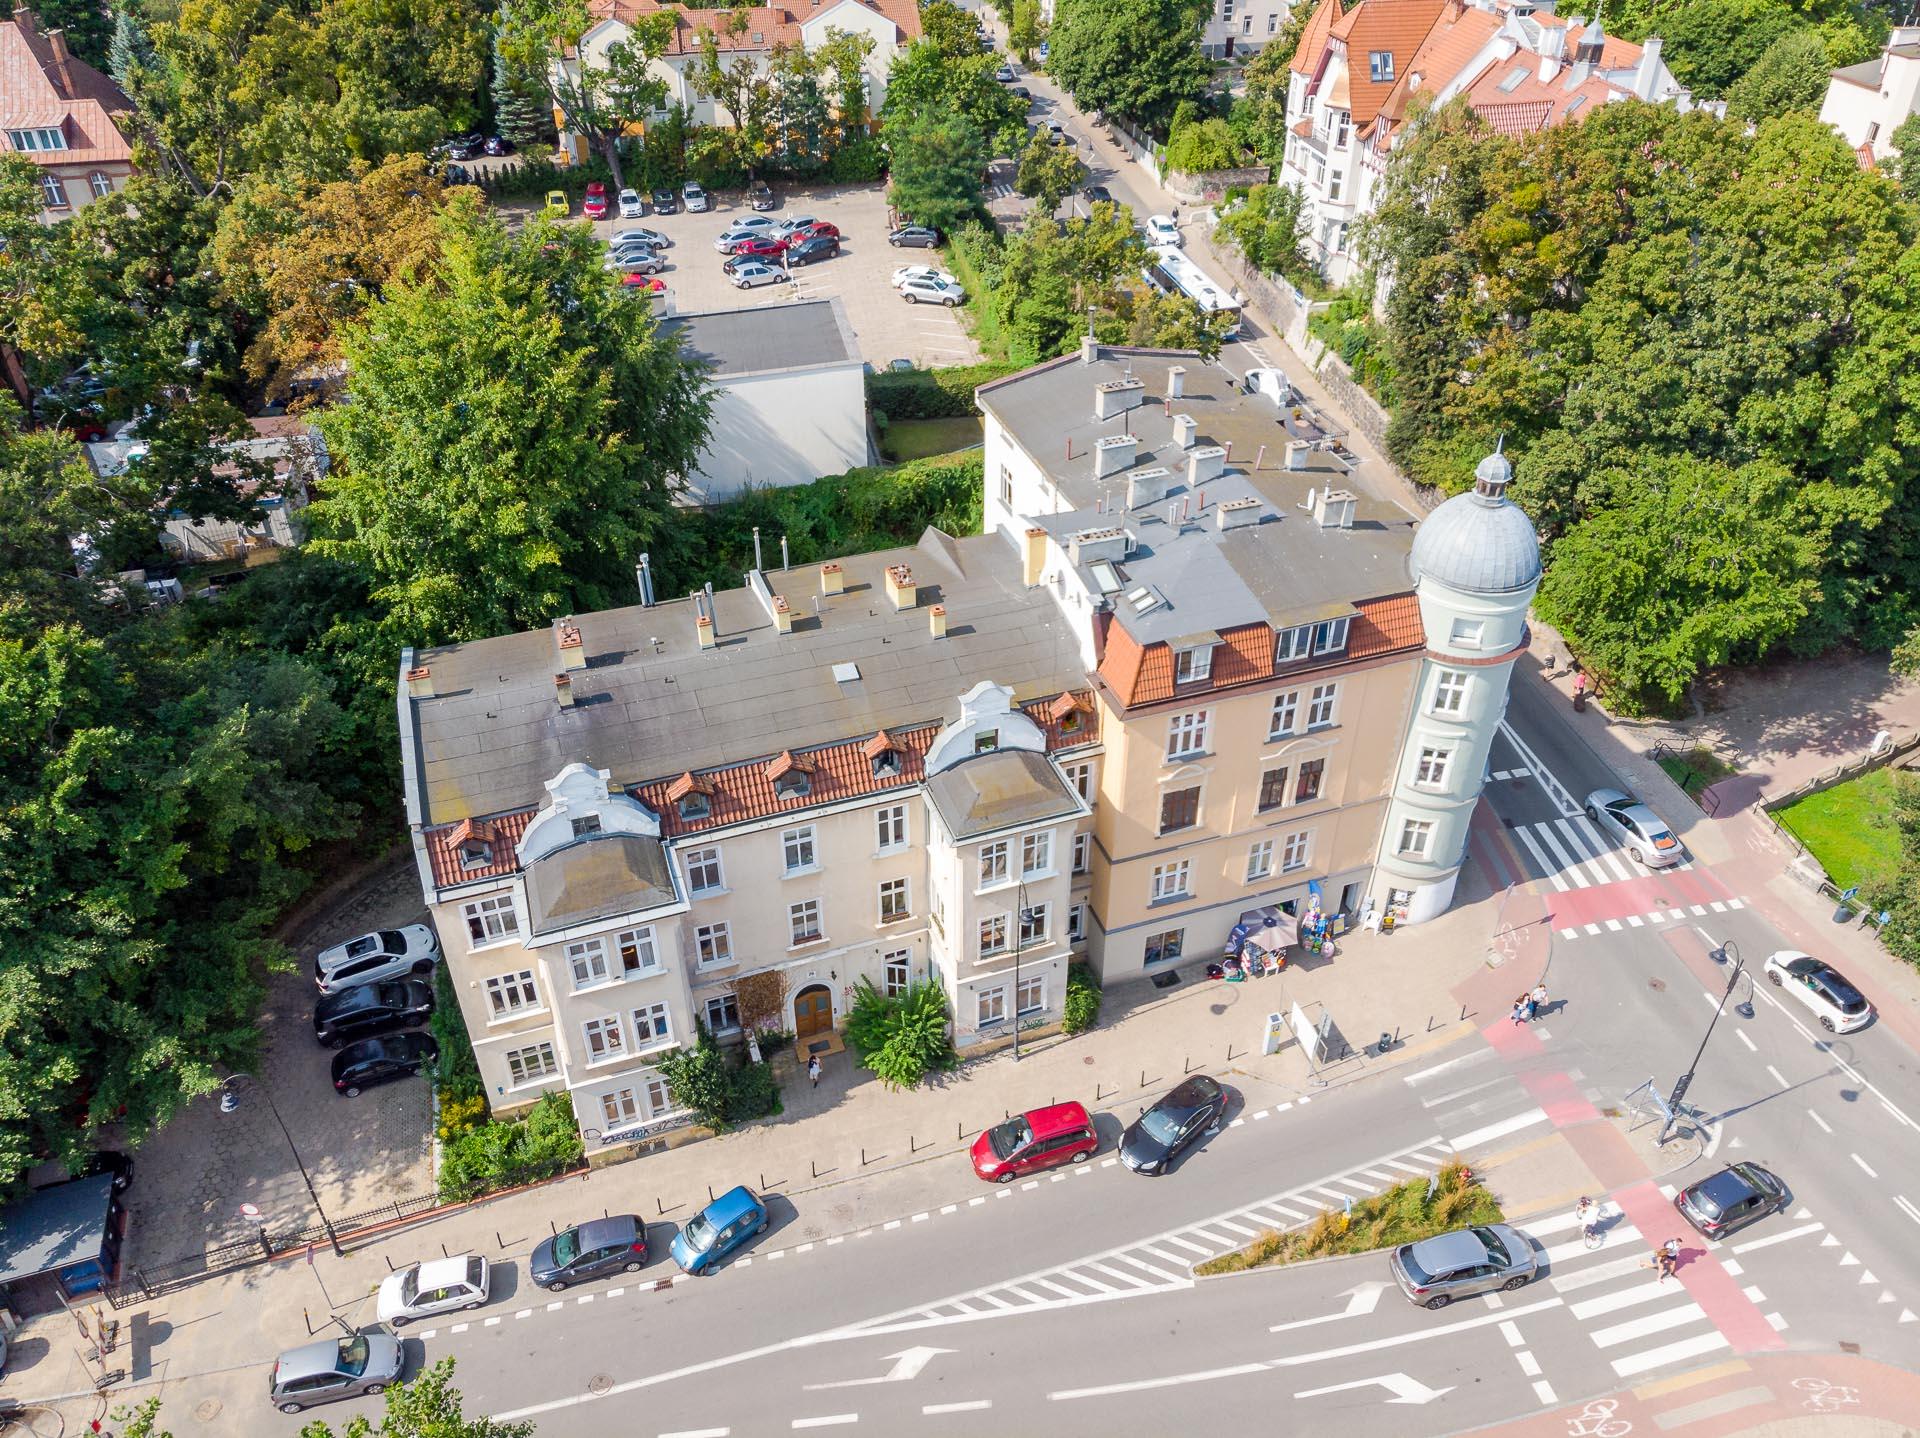 10 Tańszy Remont Z Leroy Merlin I Estate Polska Estate Polska